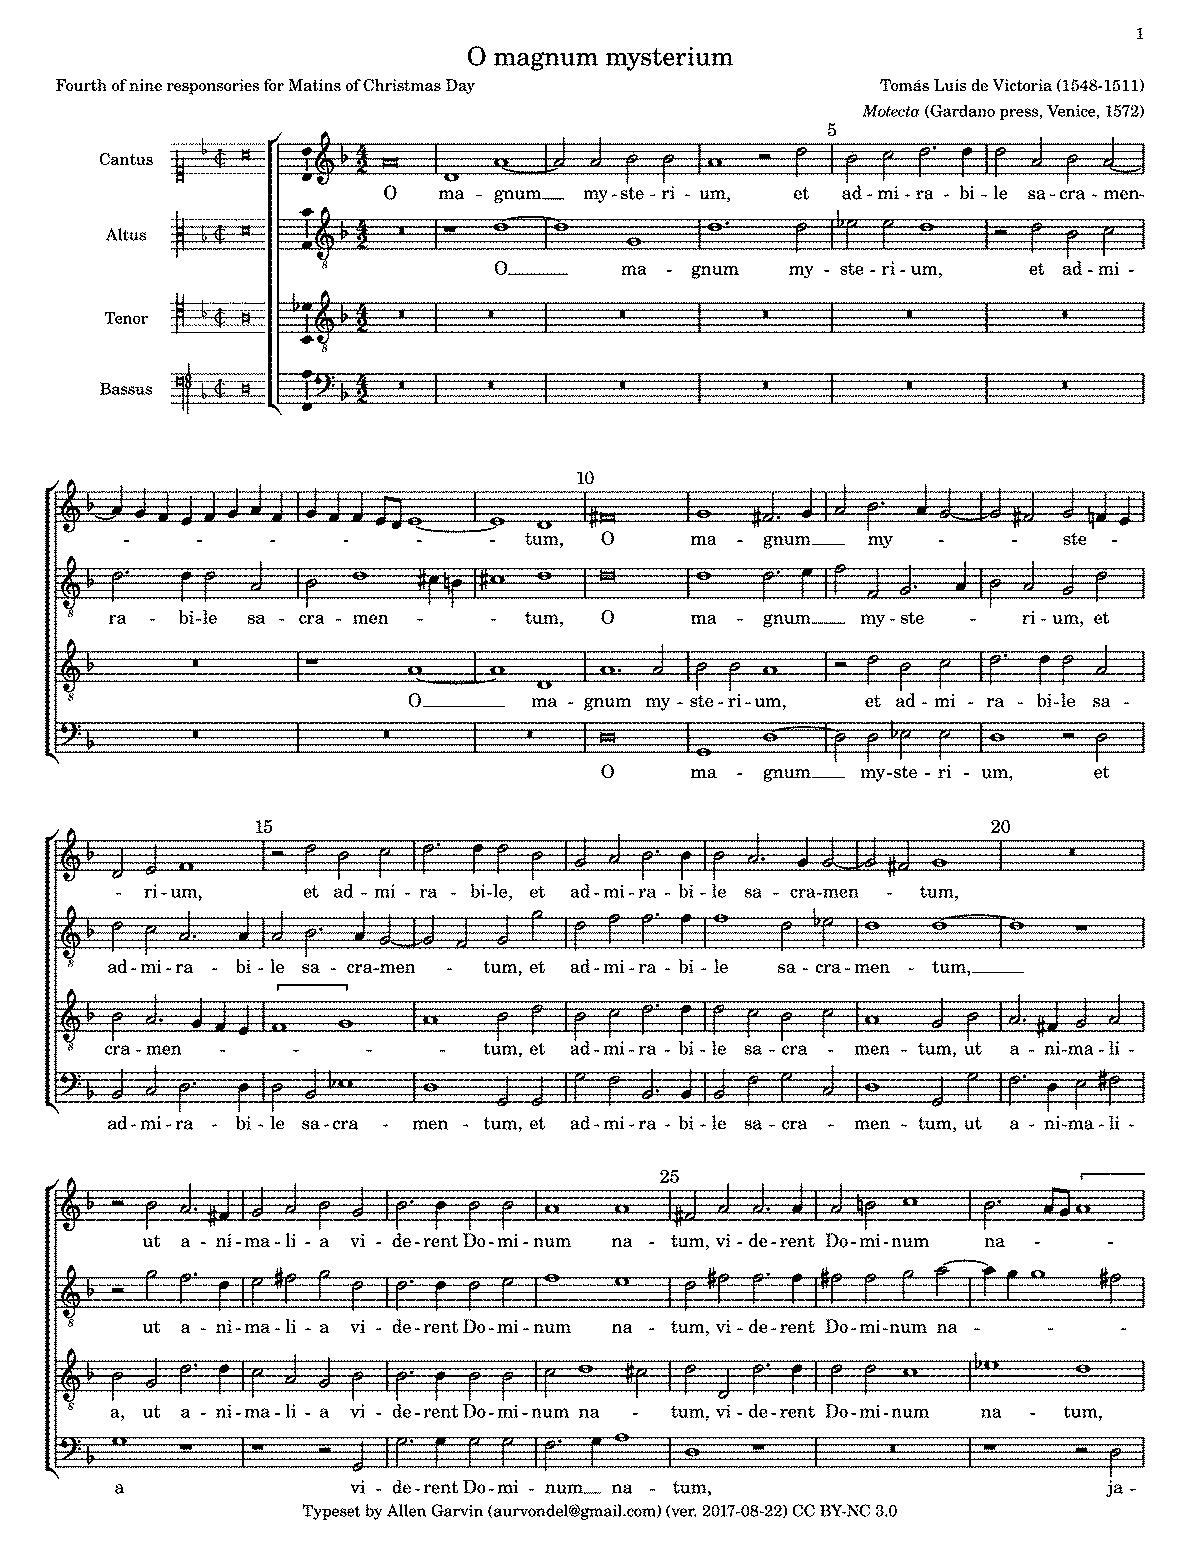 O magnum mysterium (Victoria, Tomás Luis de) - IMSLP/Petrucci Music ...